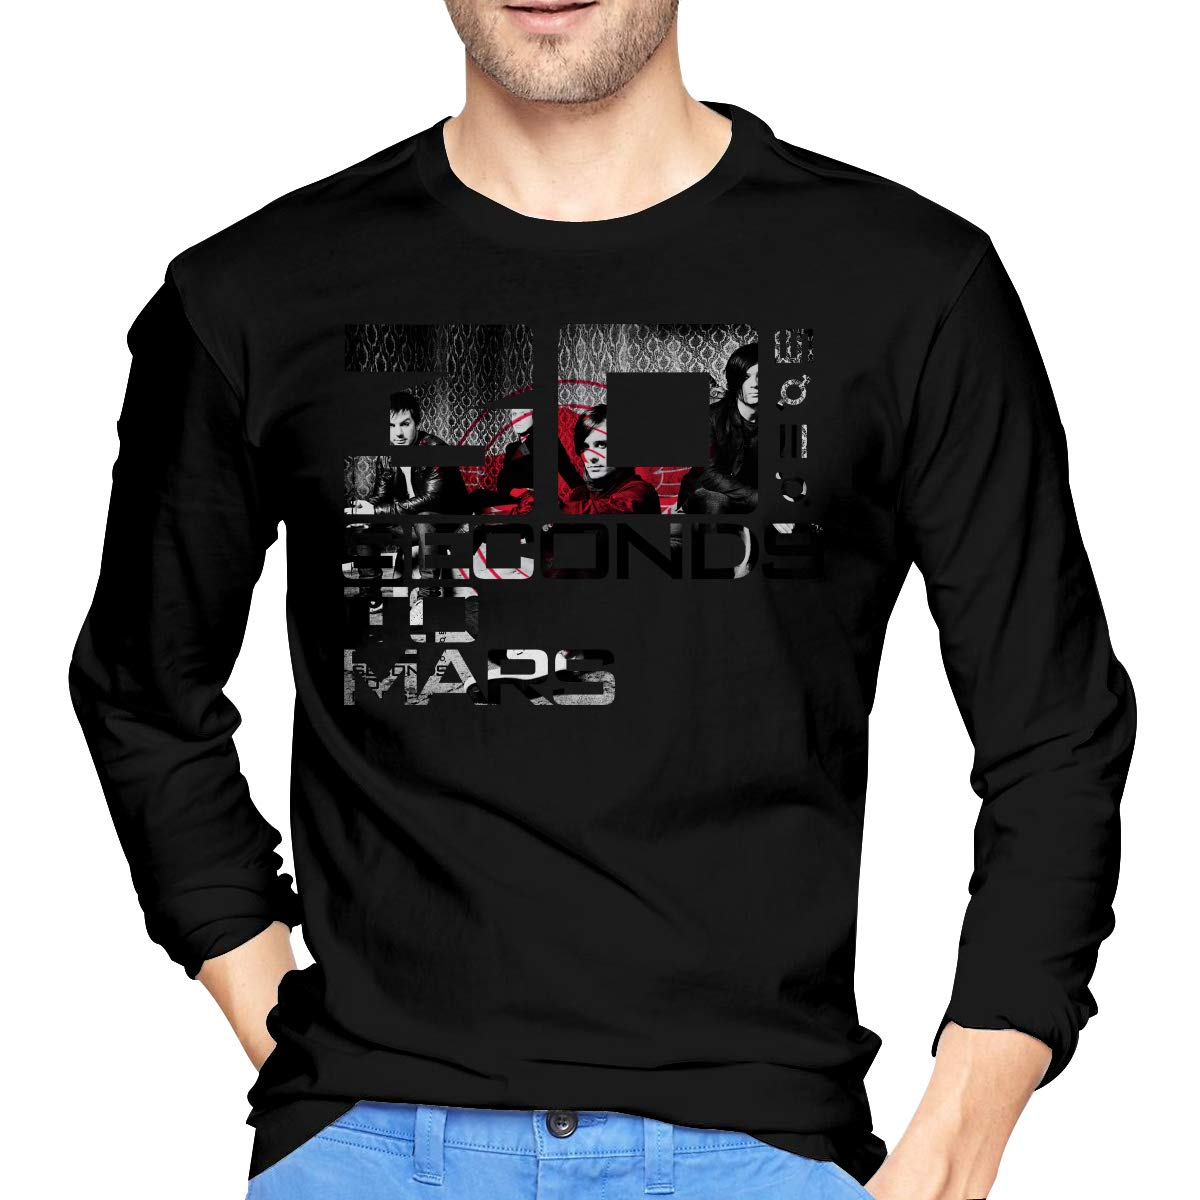 JeremiahR Mens 30 Seconds to Mars Long Sleeve T-Shirts Black L